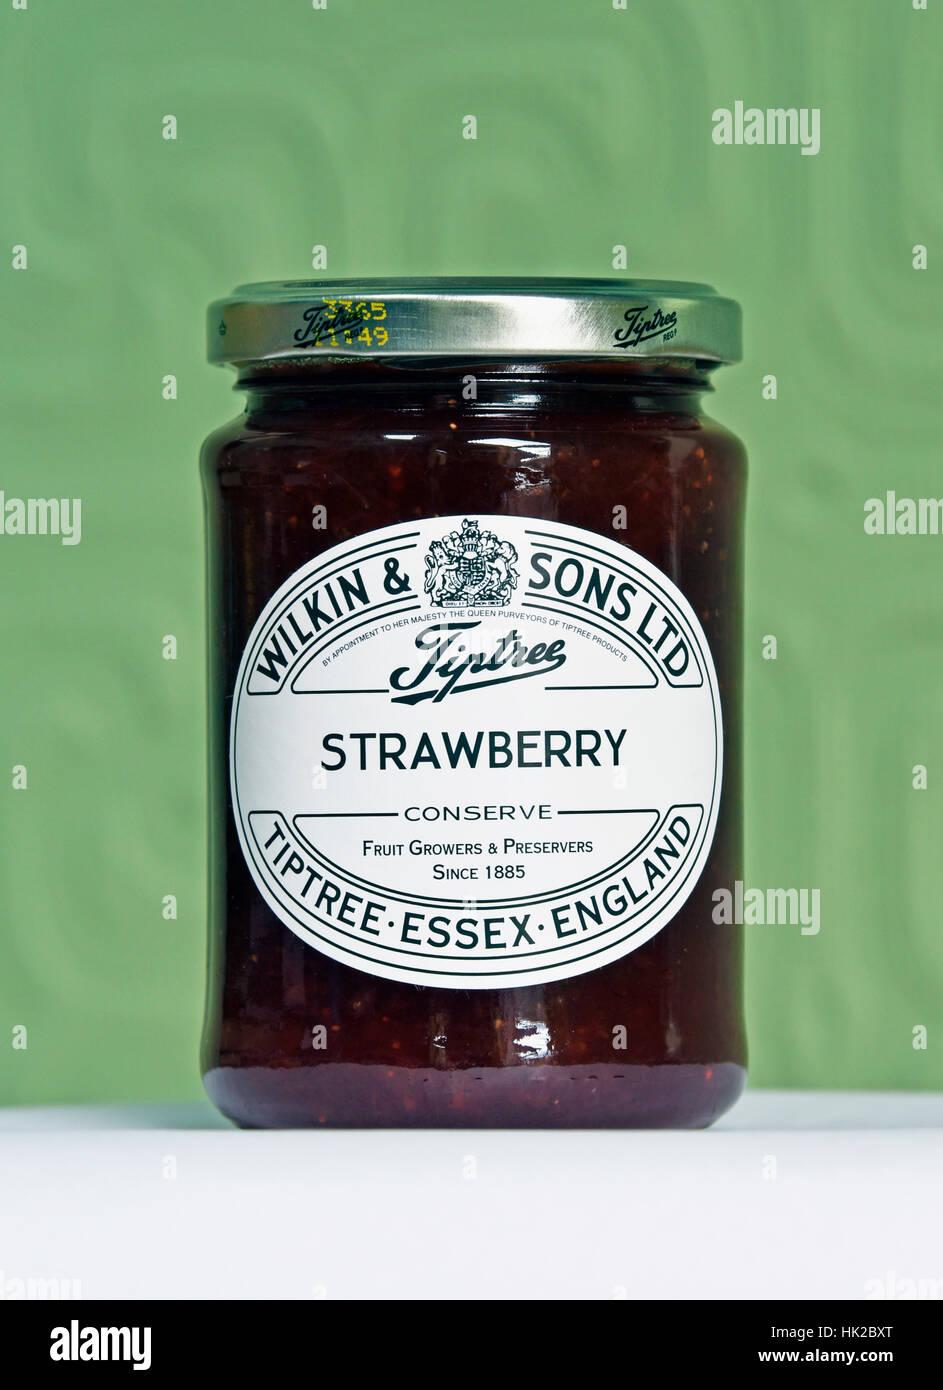 Jar of Wilkin & Sons Ltd., Tiptree Strawberry Conserve. - Stock Image